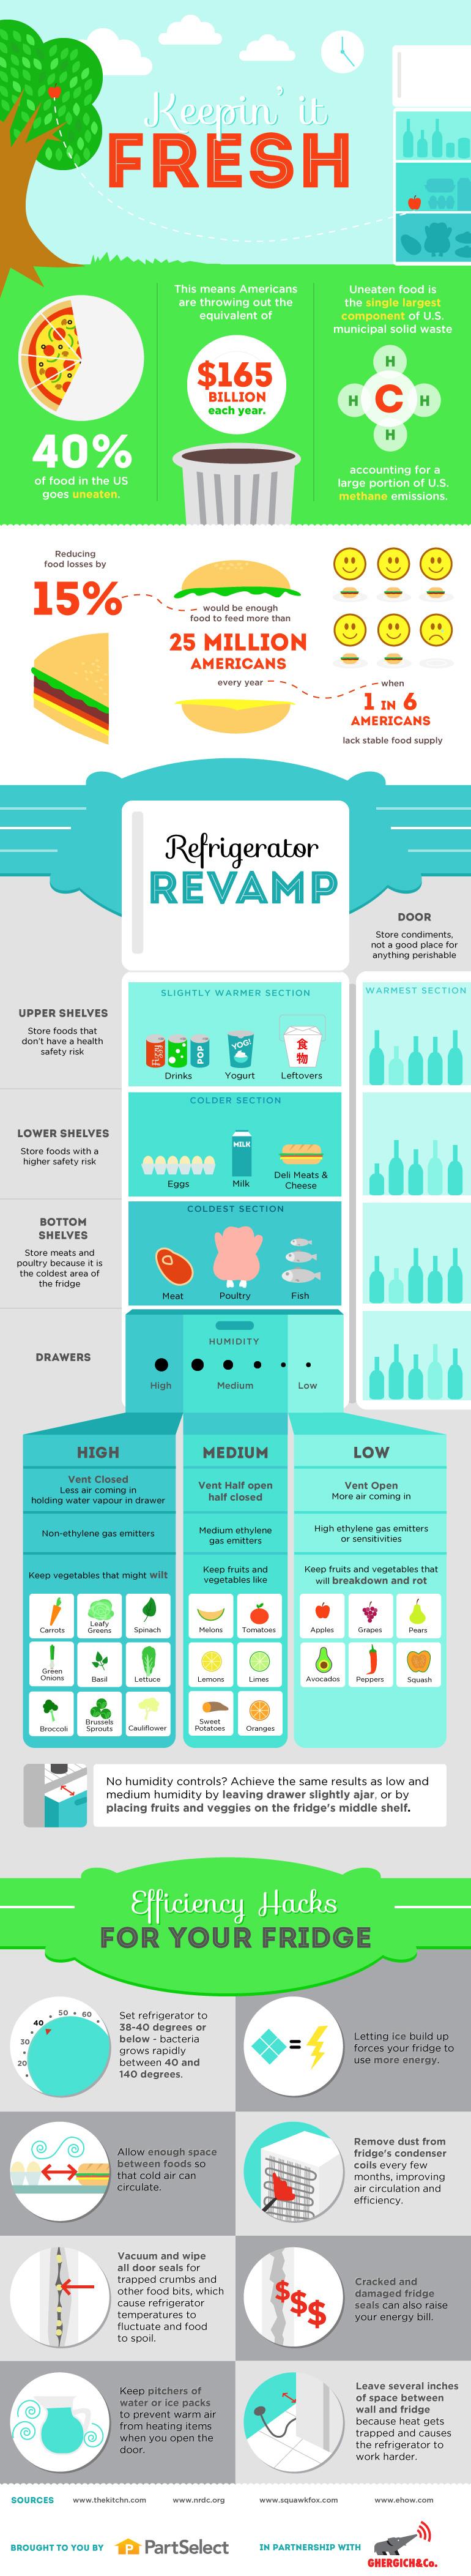 Keepin' it Fresh: Refrigerator Revamp Guide